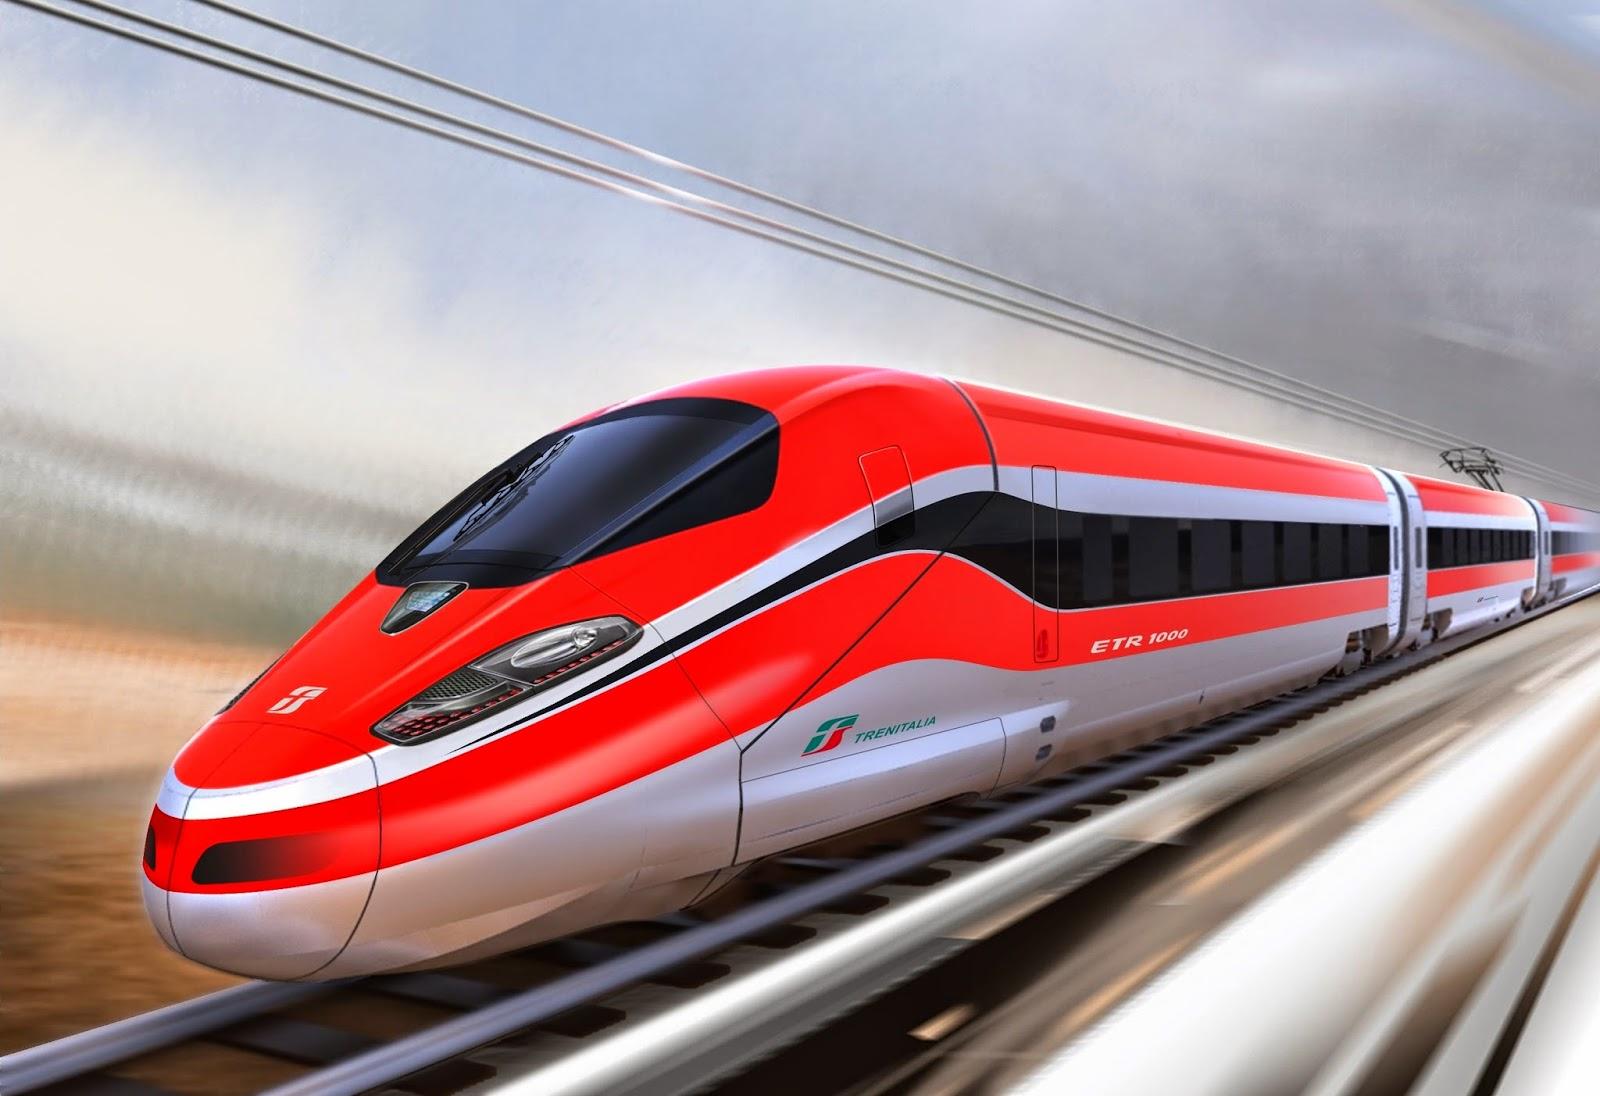 Freccia rossa torino milano rho Expo 2015